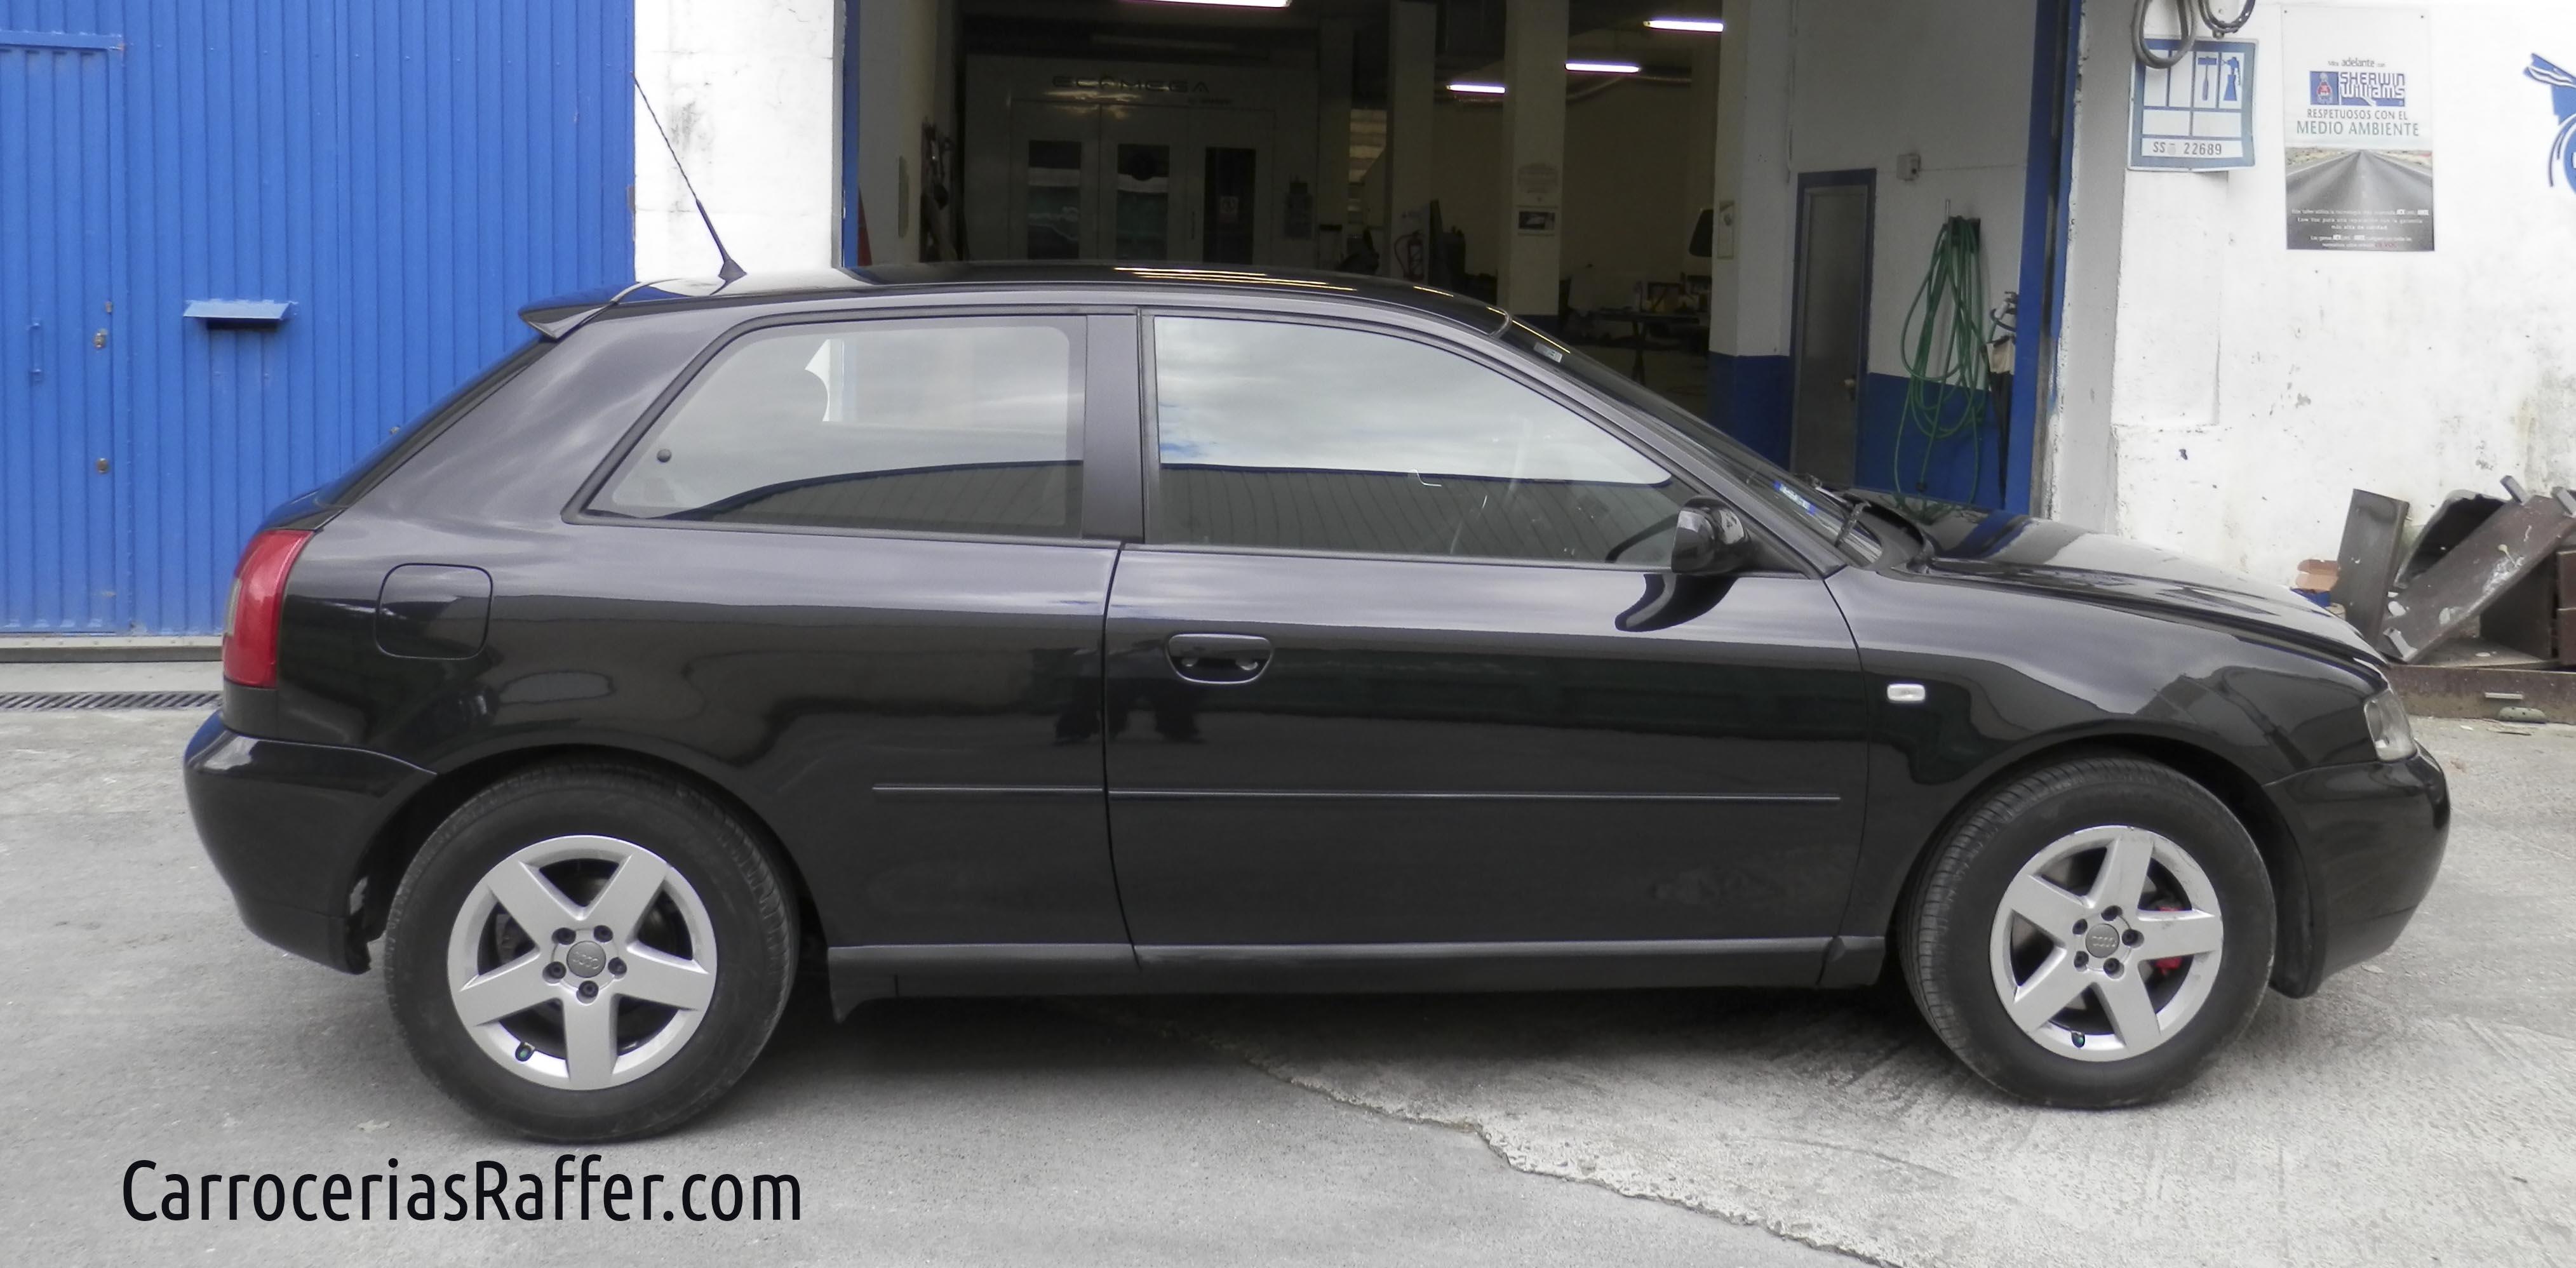 Nuevo lifting a este Audi A3 del año 2000.